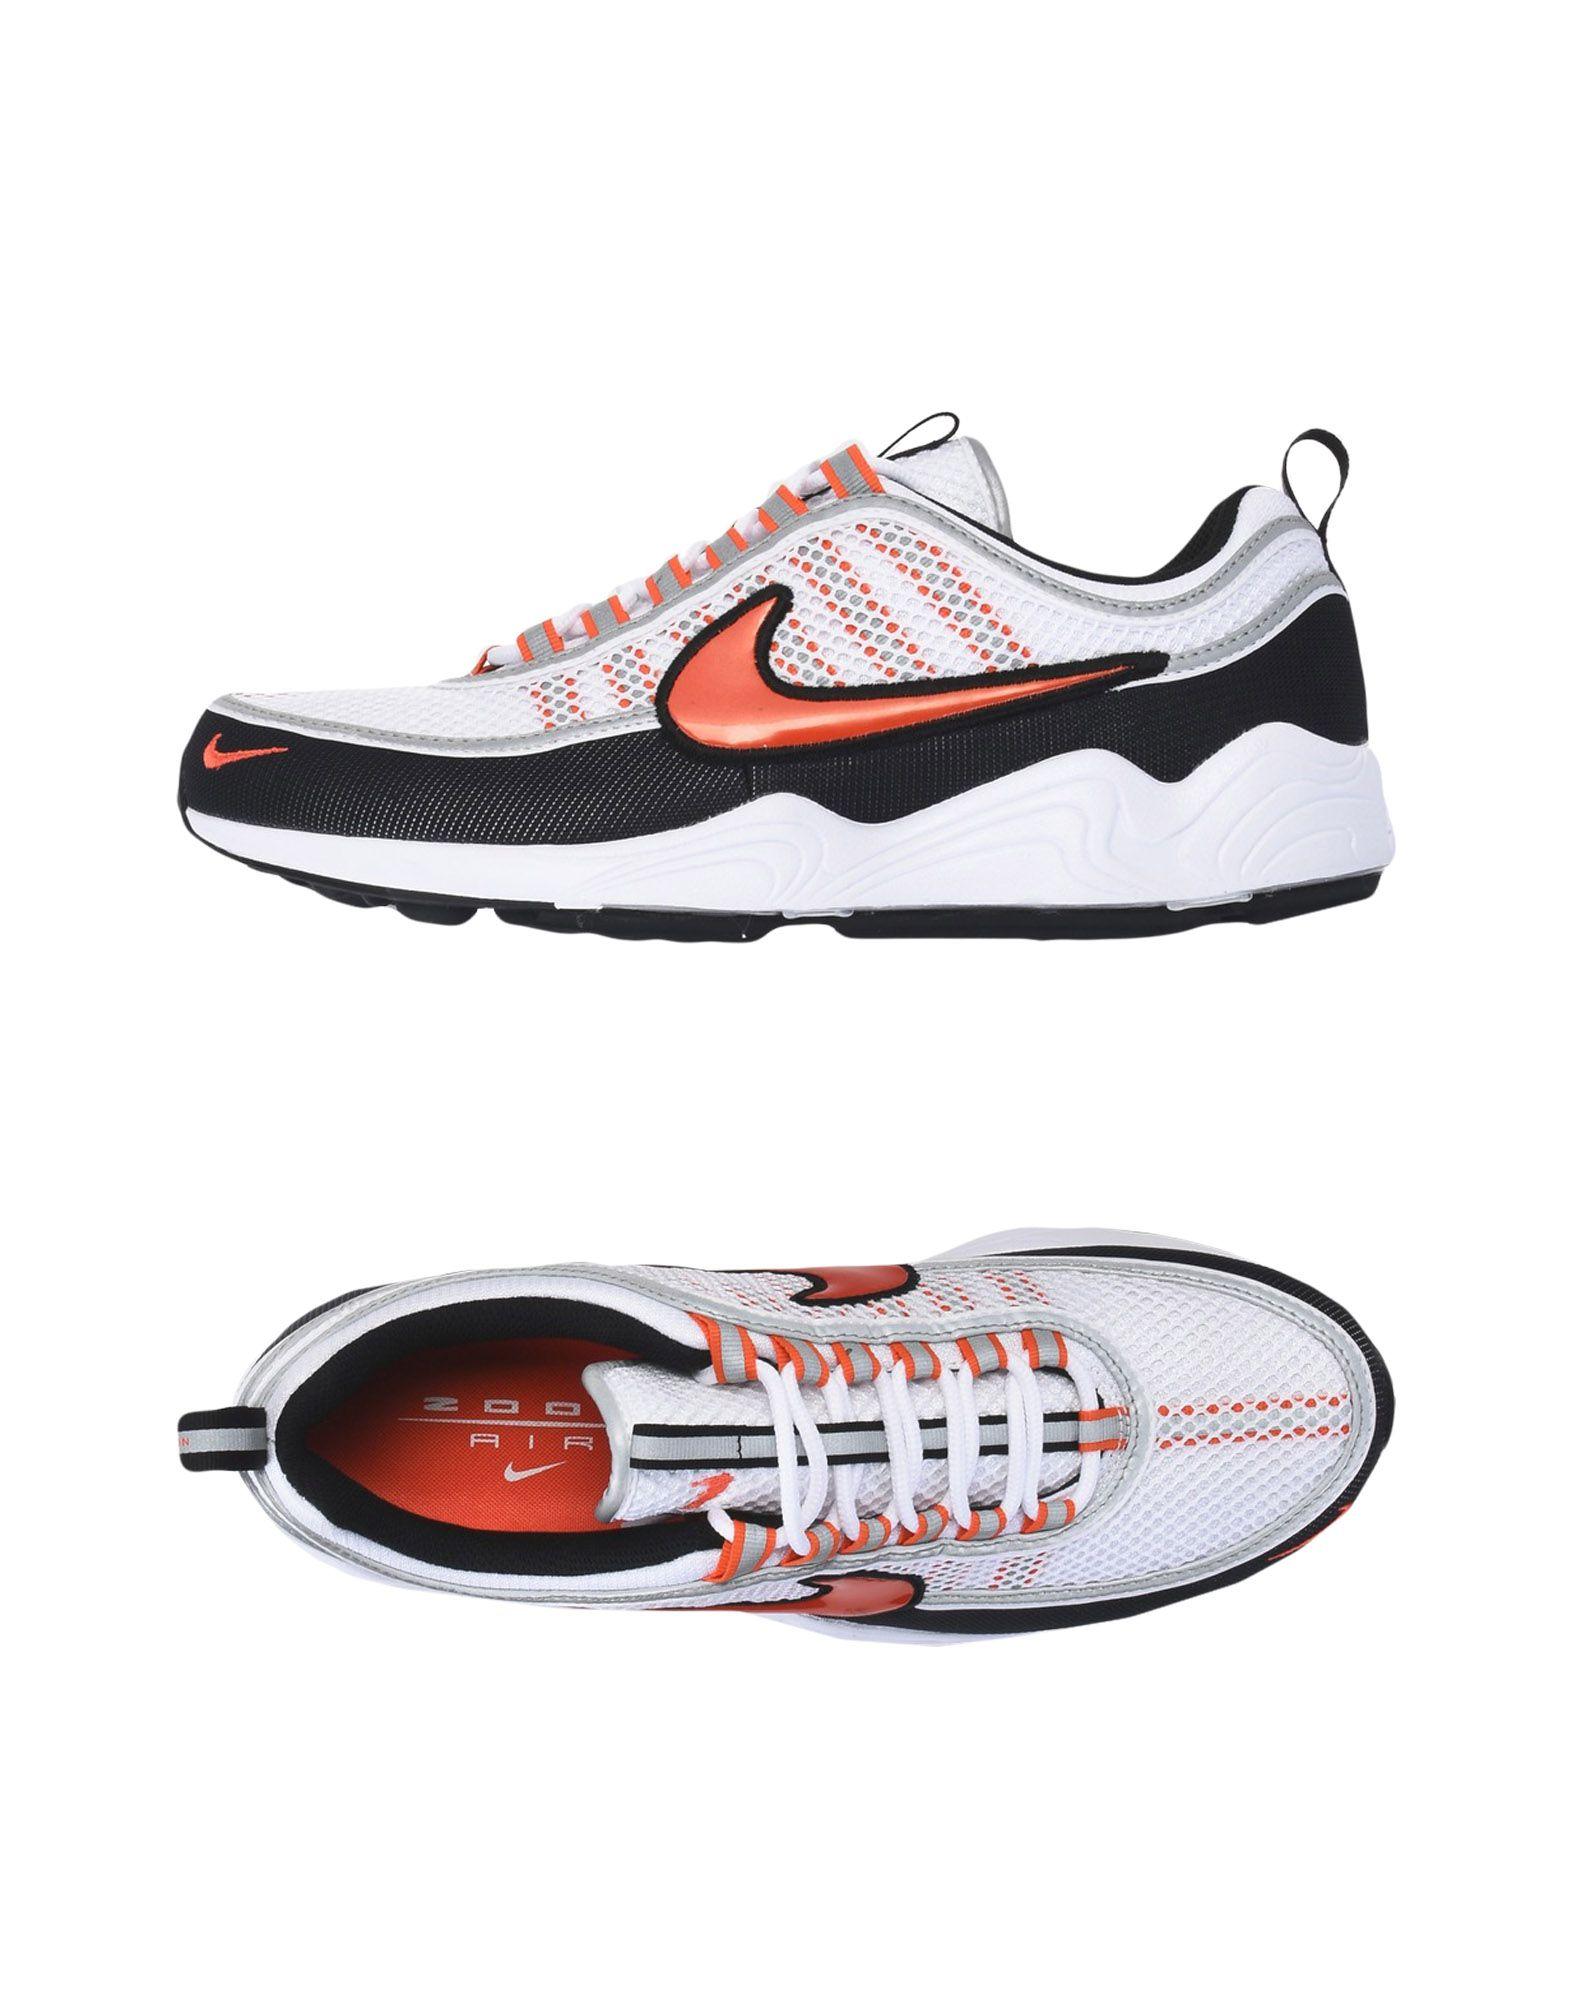 Sneakers Nike Air Zoom Spiridon '16 - Uomo - 11441122IO